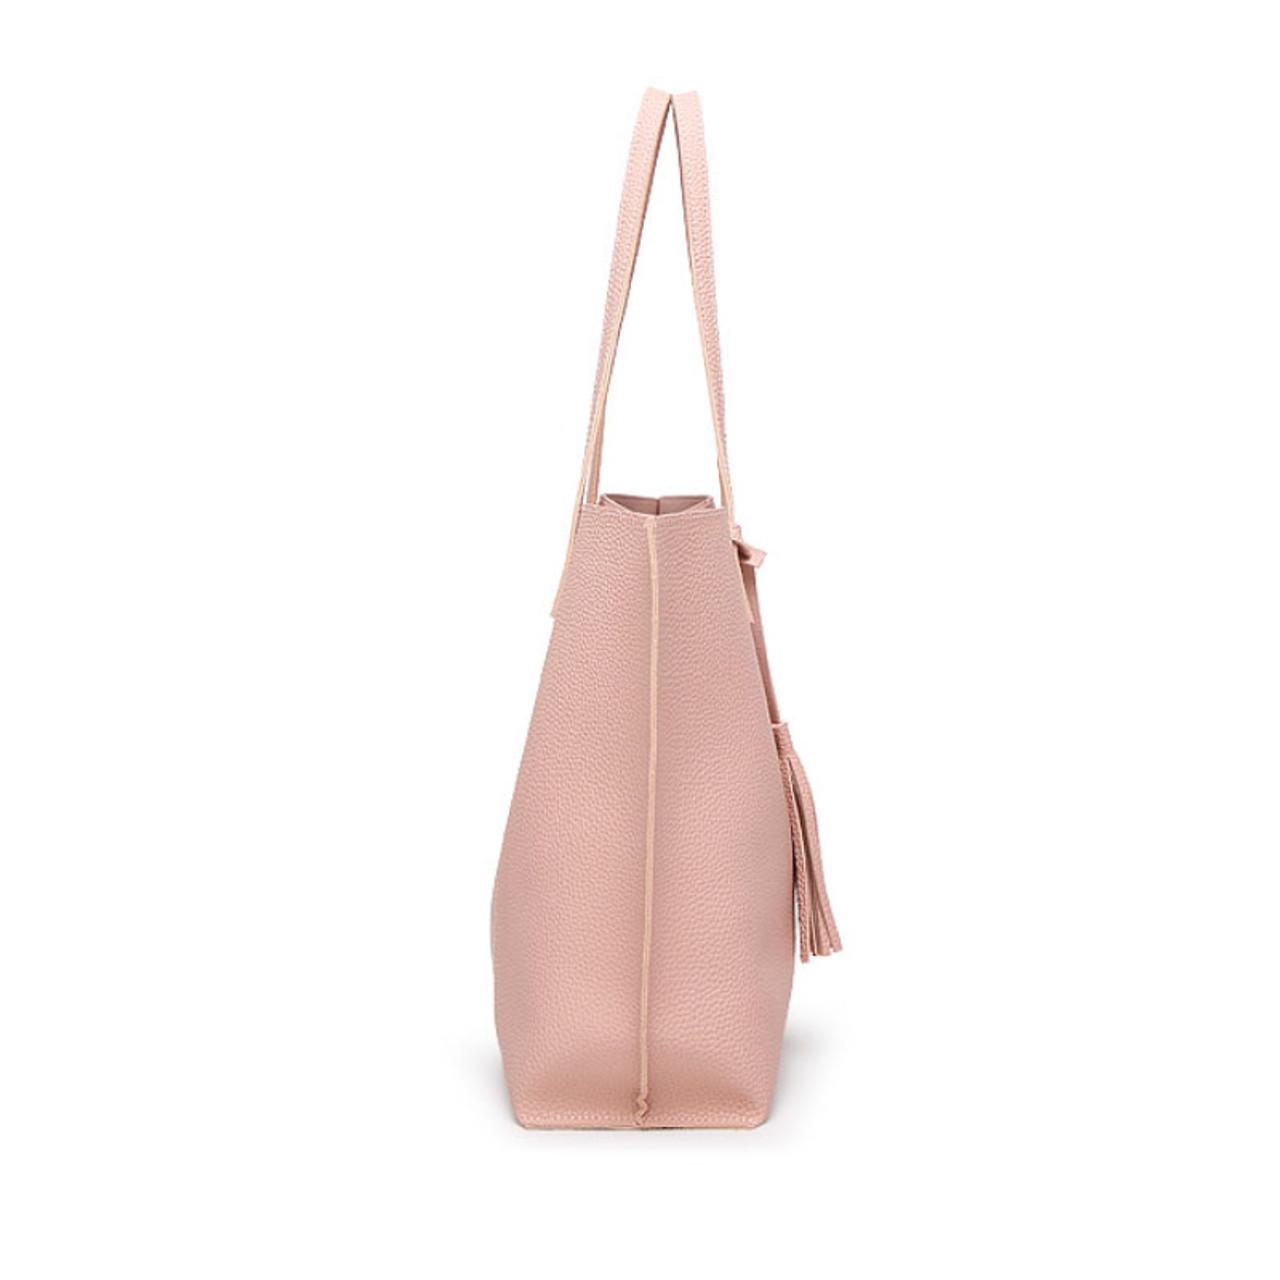 5aff035f4314 Ankareeda Luxury Brand Women Shoulder Bag Soft Leather TopHandle Bags  Ladies Tassel Tote Handbag High Quality Women's Handbags